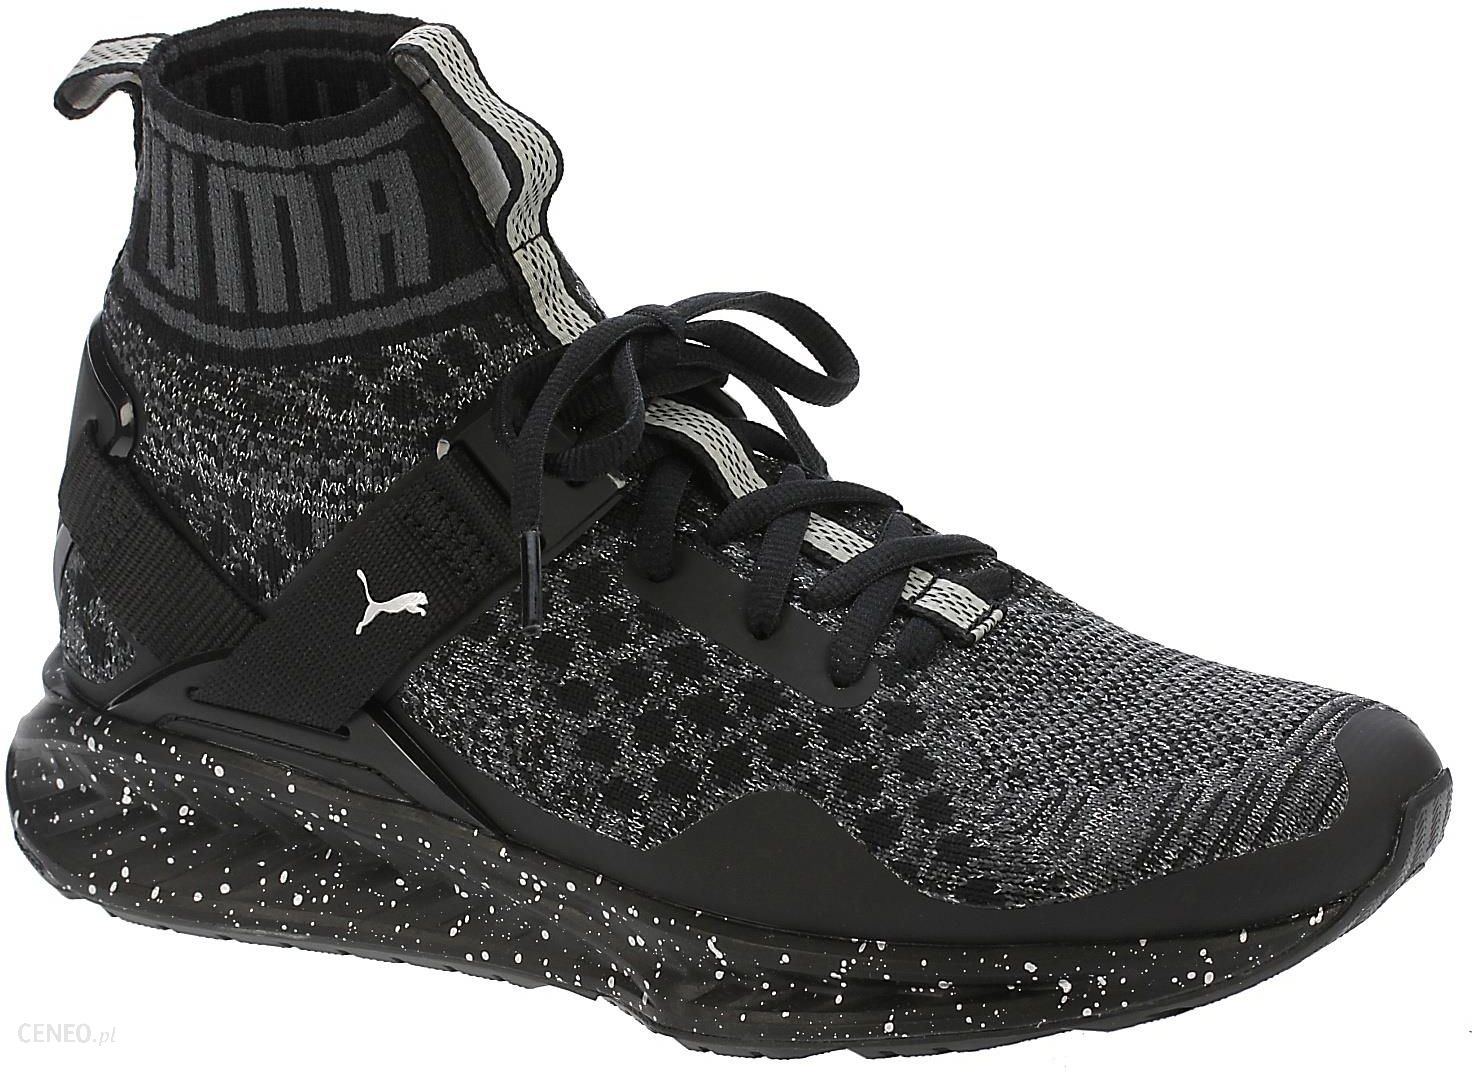 9362fbcf buty Puma Ignite Evoknit Metal - Puma Black/Asphalt/Silver 37 - zdjęcie 1